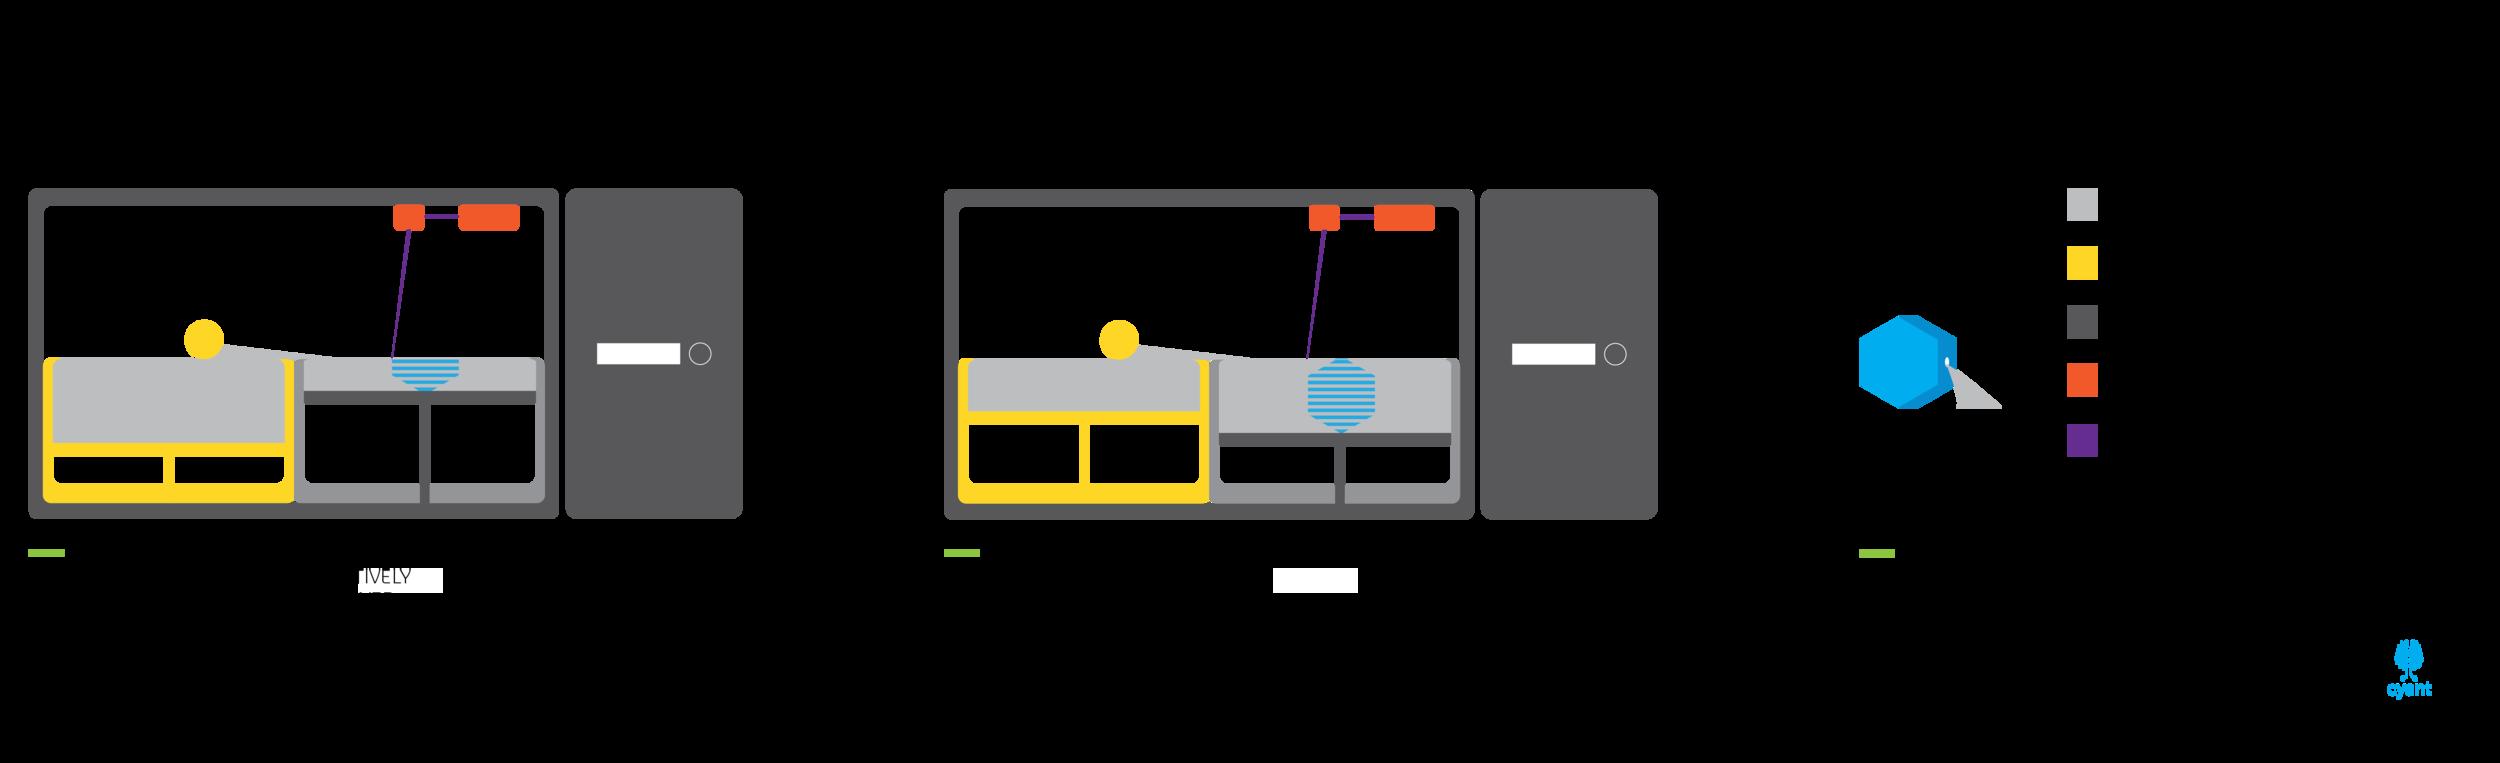 The SLS 3D printing process. (Source: Cyant)